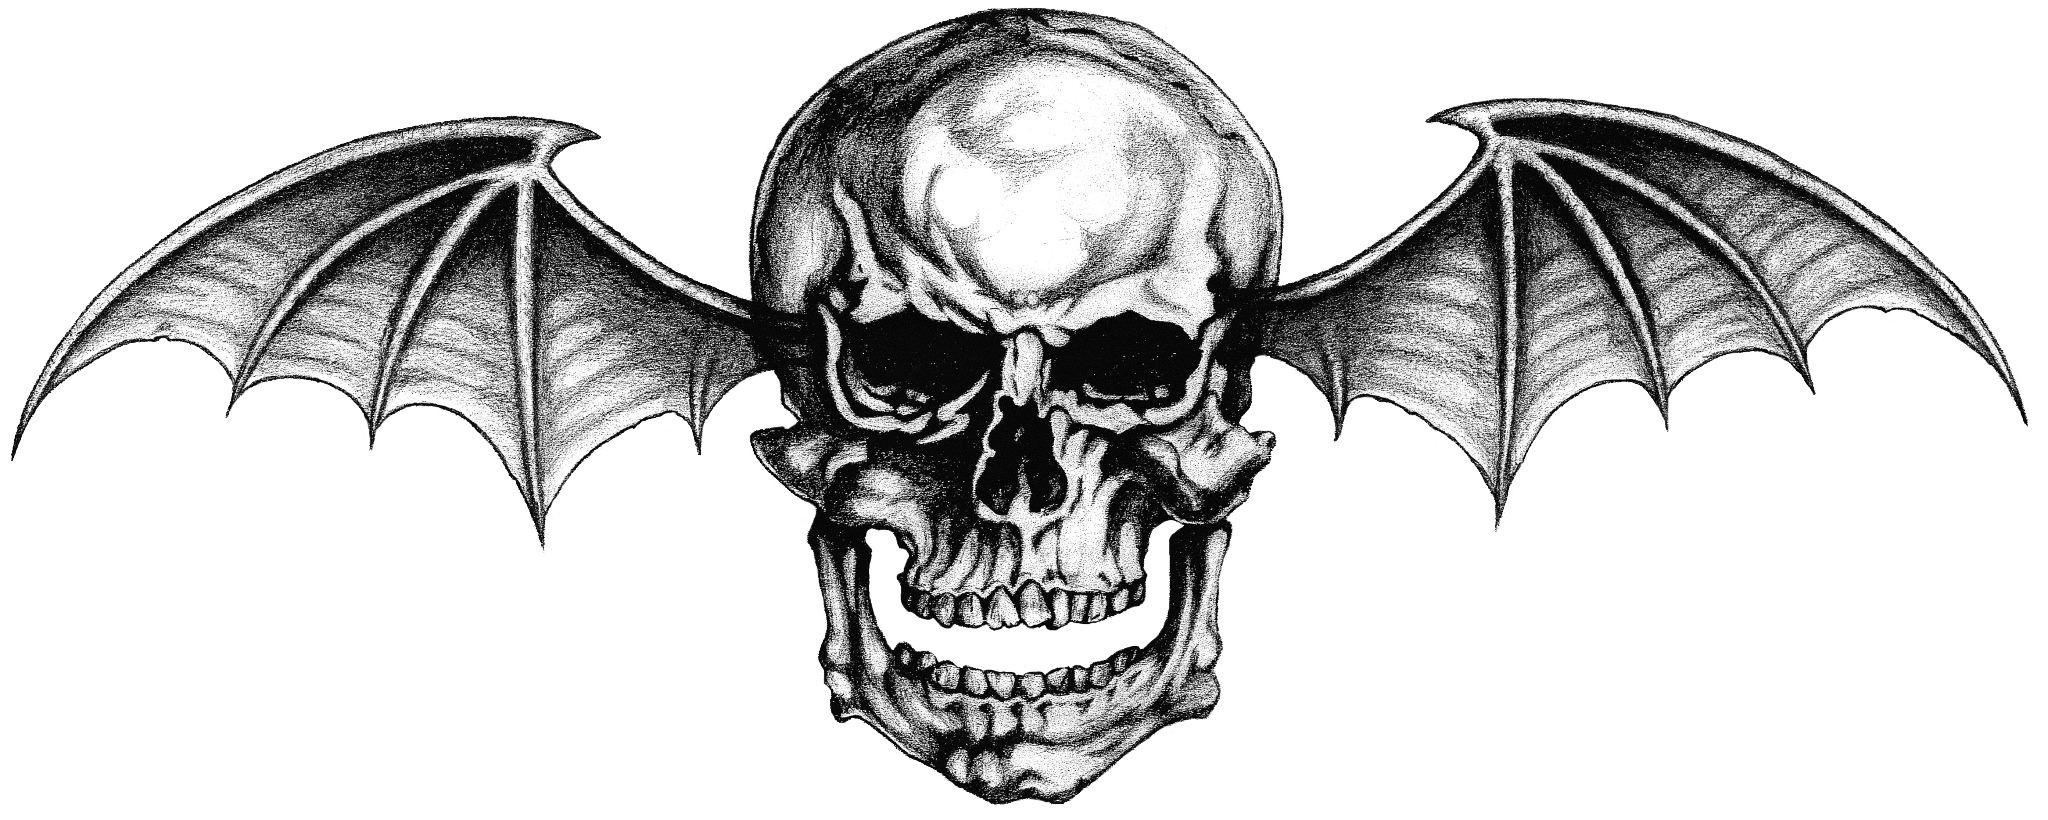 Avenged Sevenfold (con imágenes) Tatuaje de avenged